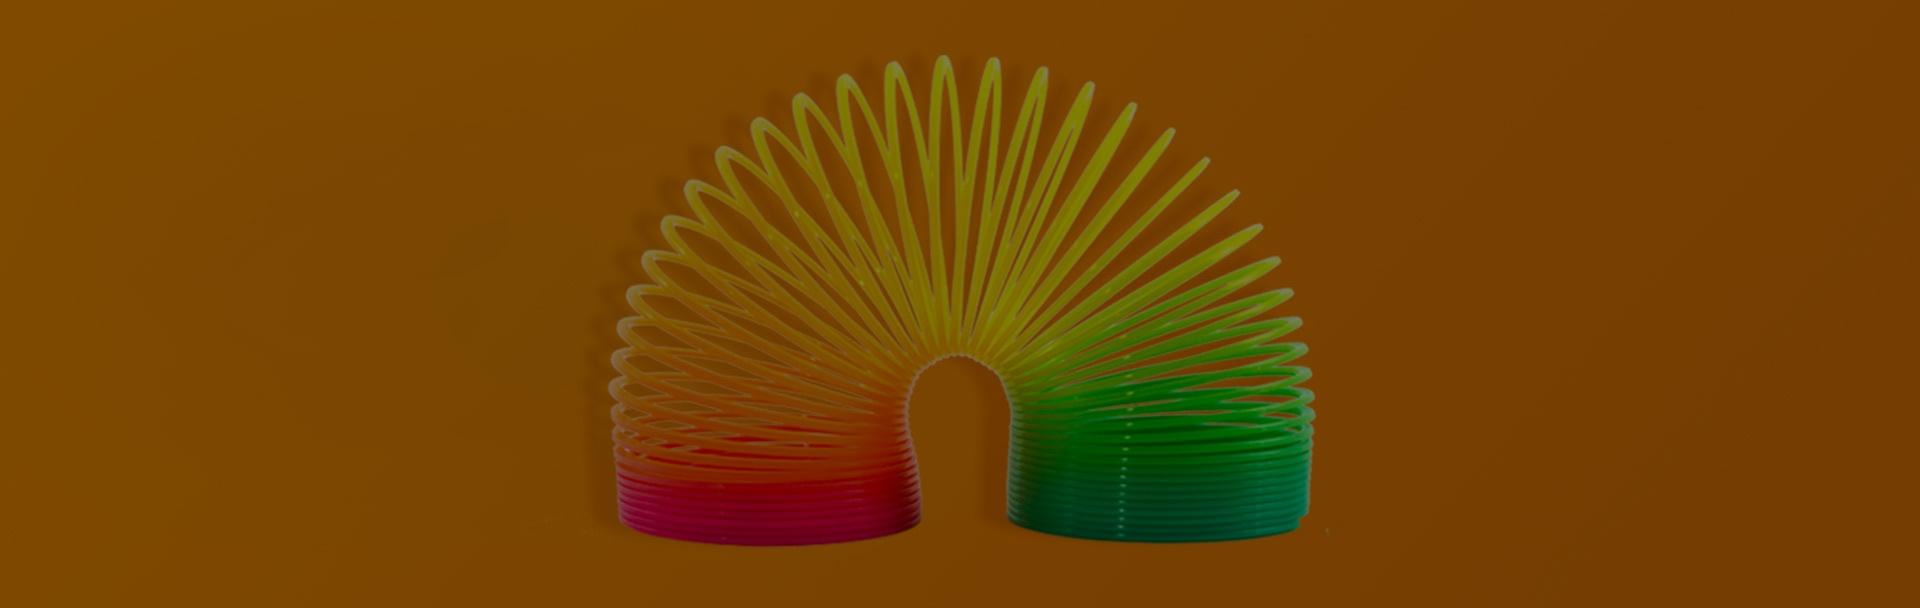 solucionweb-banner-blog--1.jpg